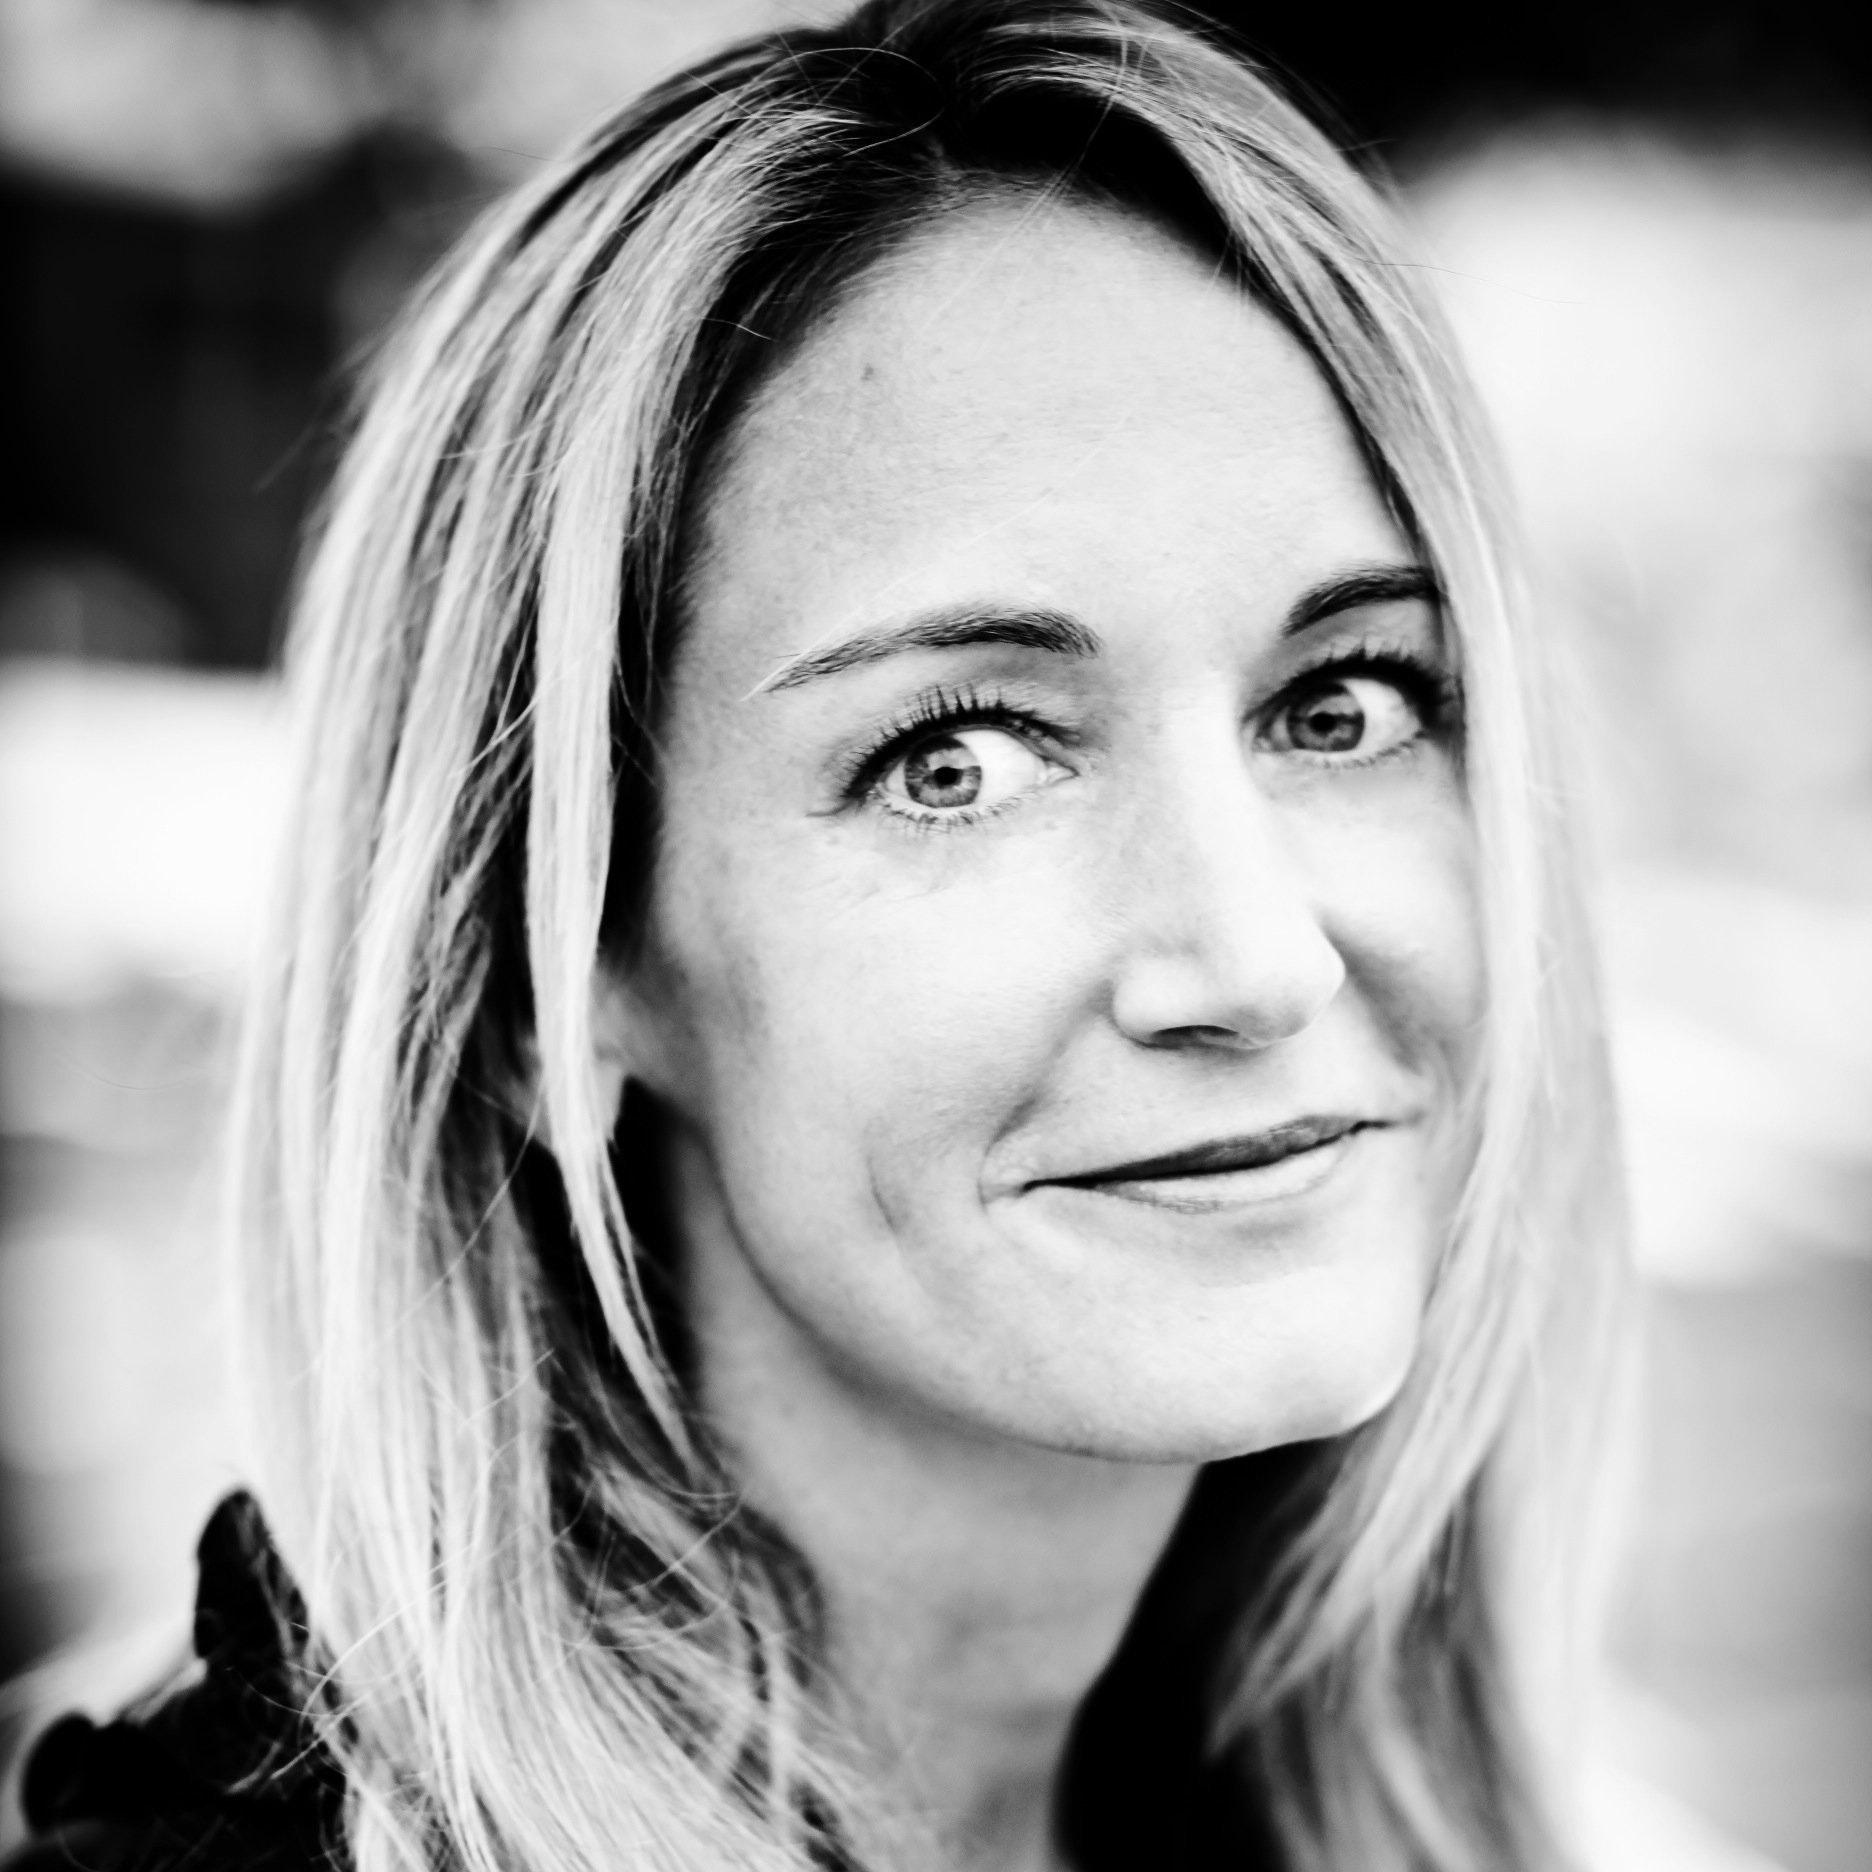 Christa Olson